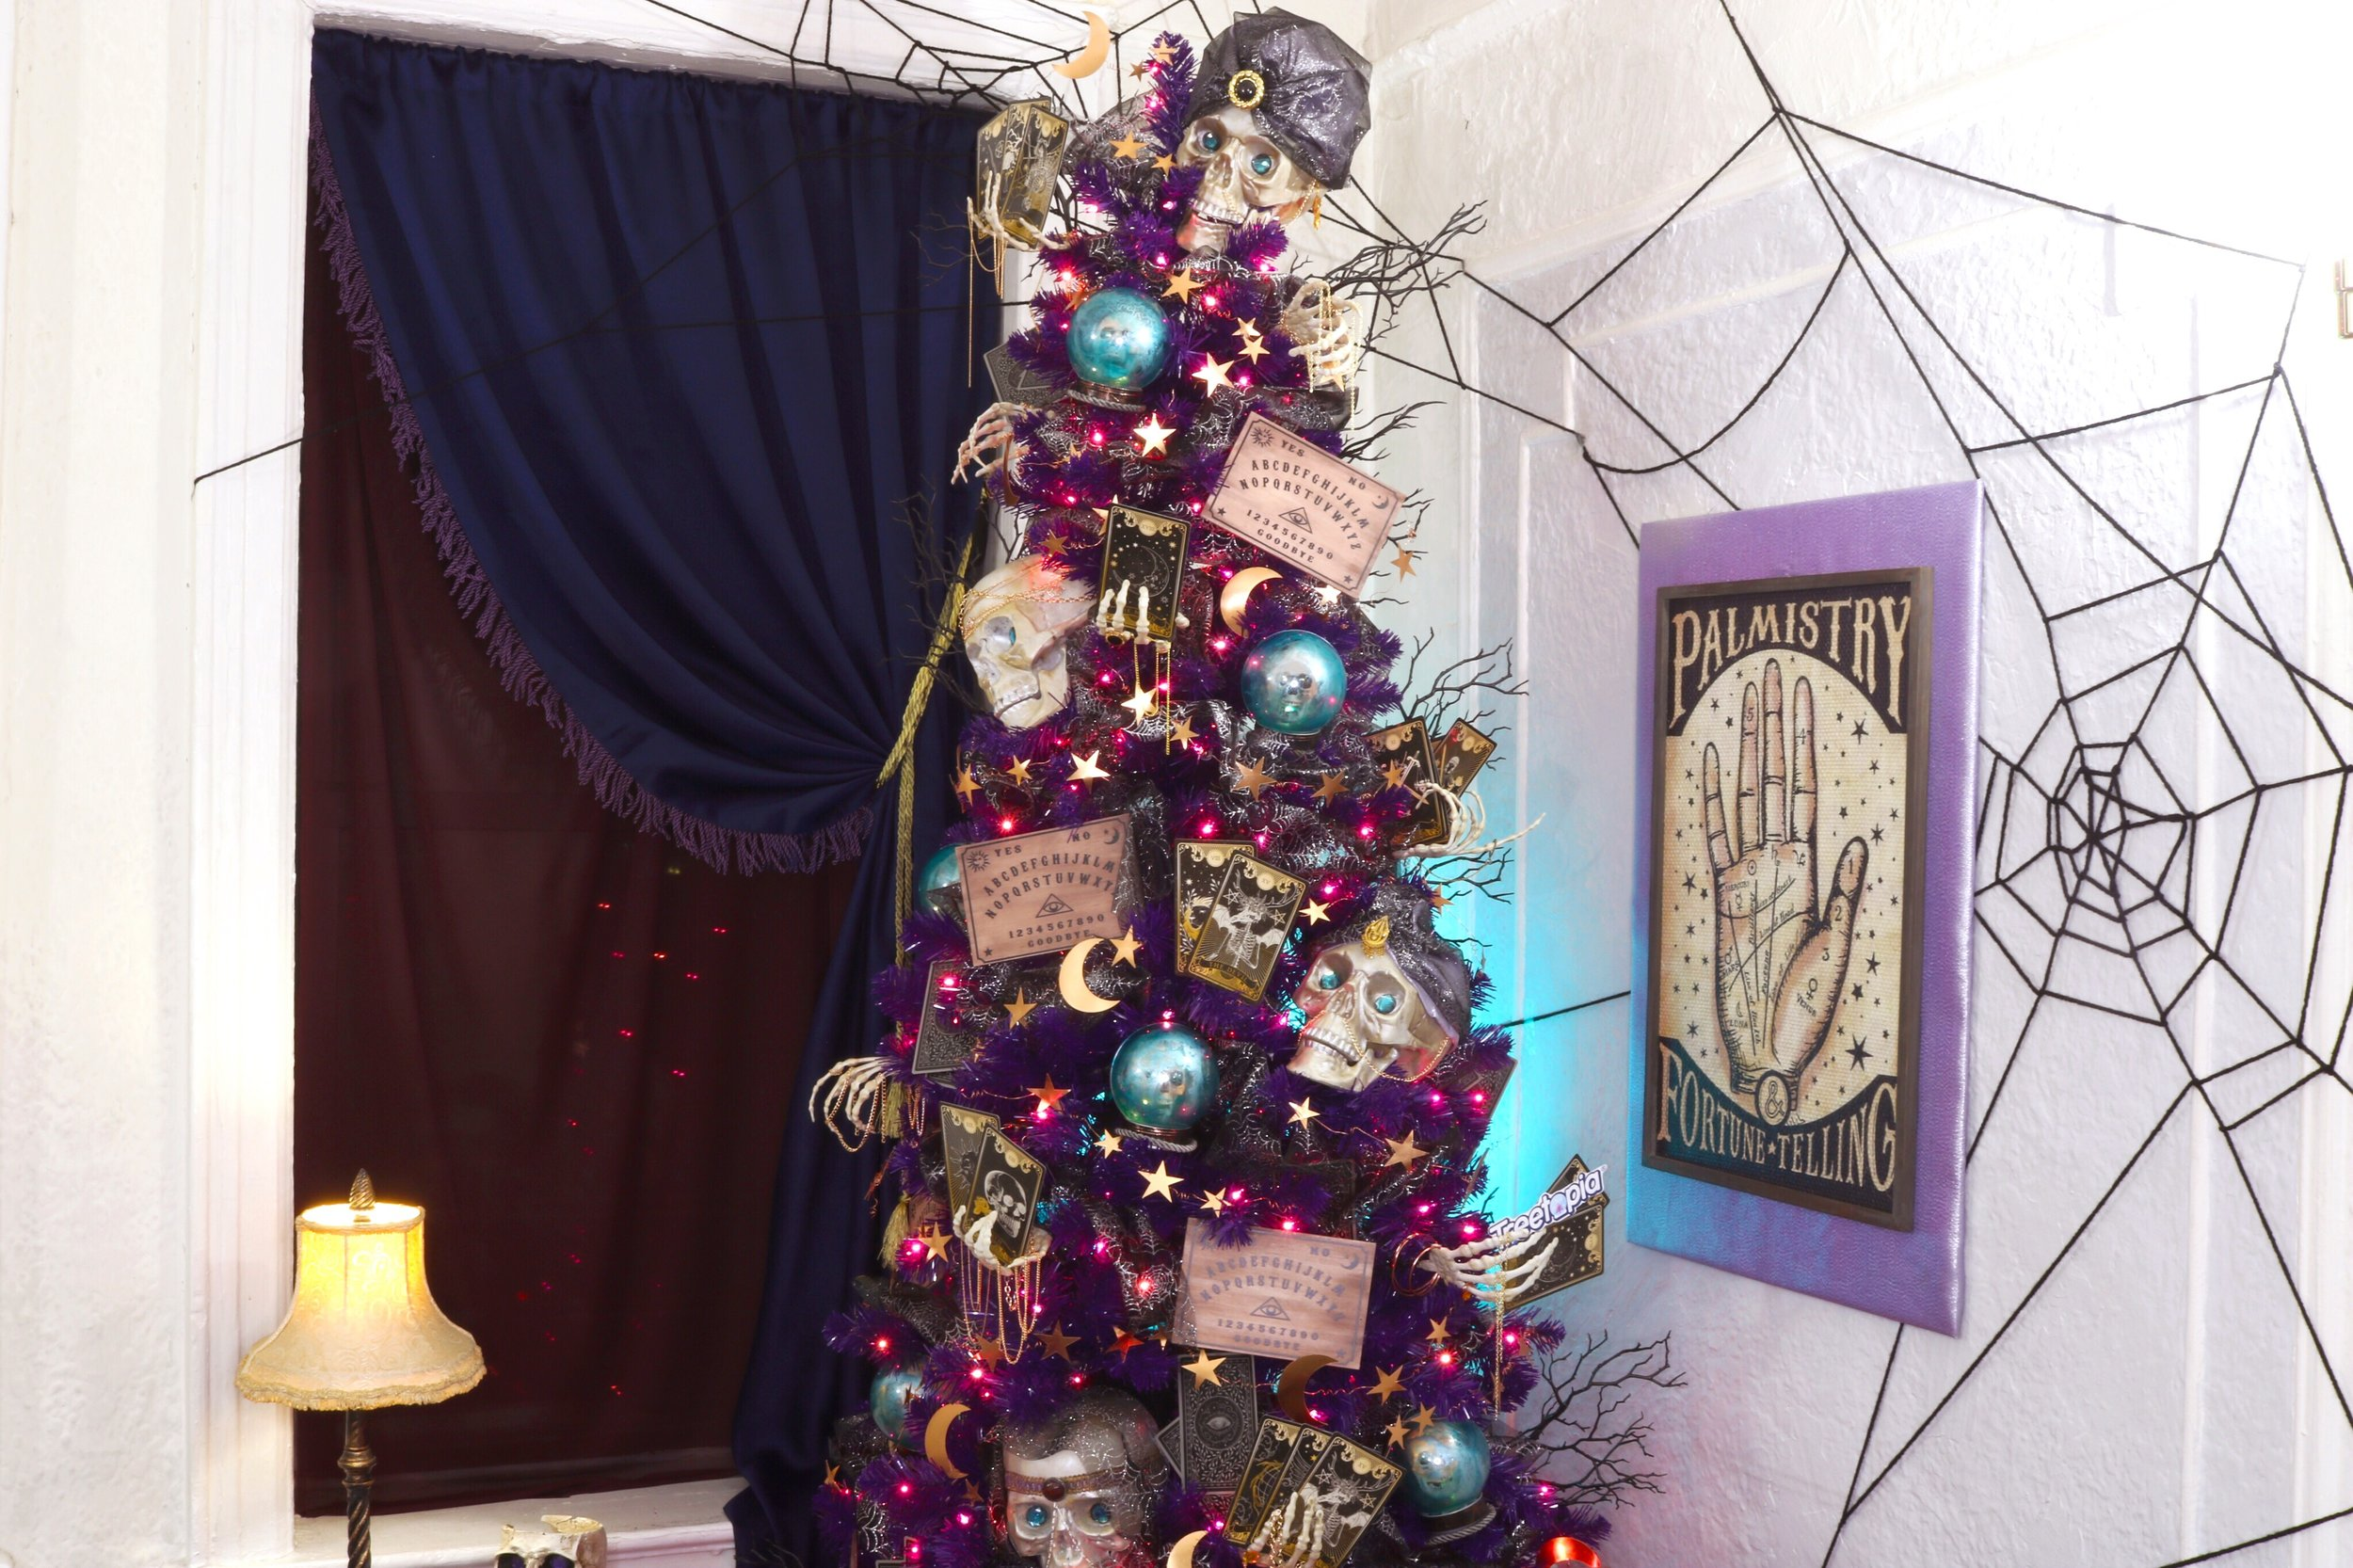 Psychic Fortune Teller Halloween Tree Diy and Treetopia Giveaway! #Halloween #Halloweendecor #halloweendiy #hauntedhouse #halloweentree #halloweenornamnets #psychic #fortuneteller #mystical #treetopia #halloweengiveaway #halloweenchristmastree #notsospookyhalloween #skeleton #fortune #vintagehalloween #purpletree #TreetopiaScaryRooms #TreetopiaHalloween #TreetopiaScavengerHunt